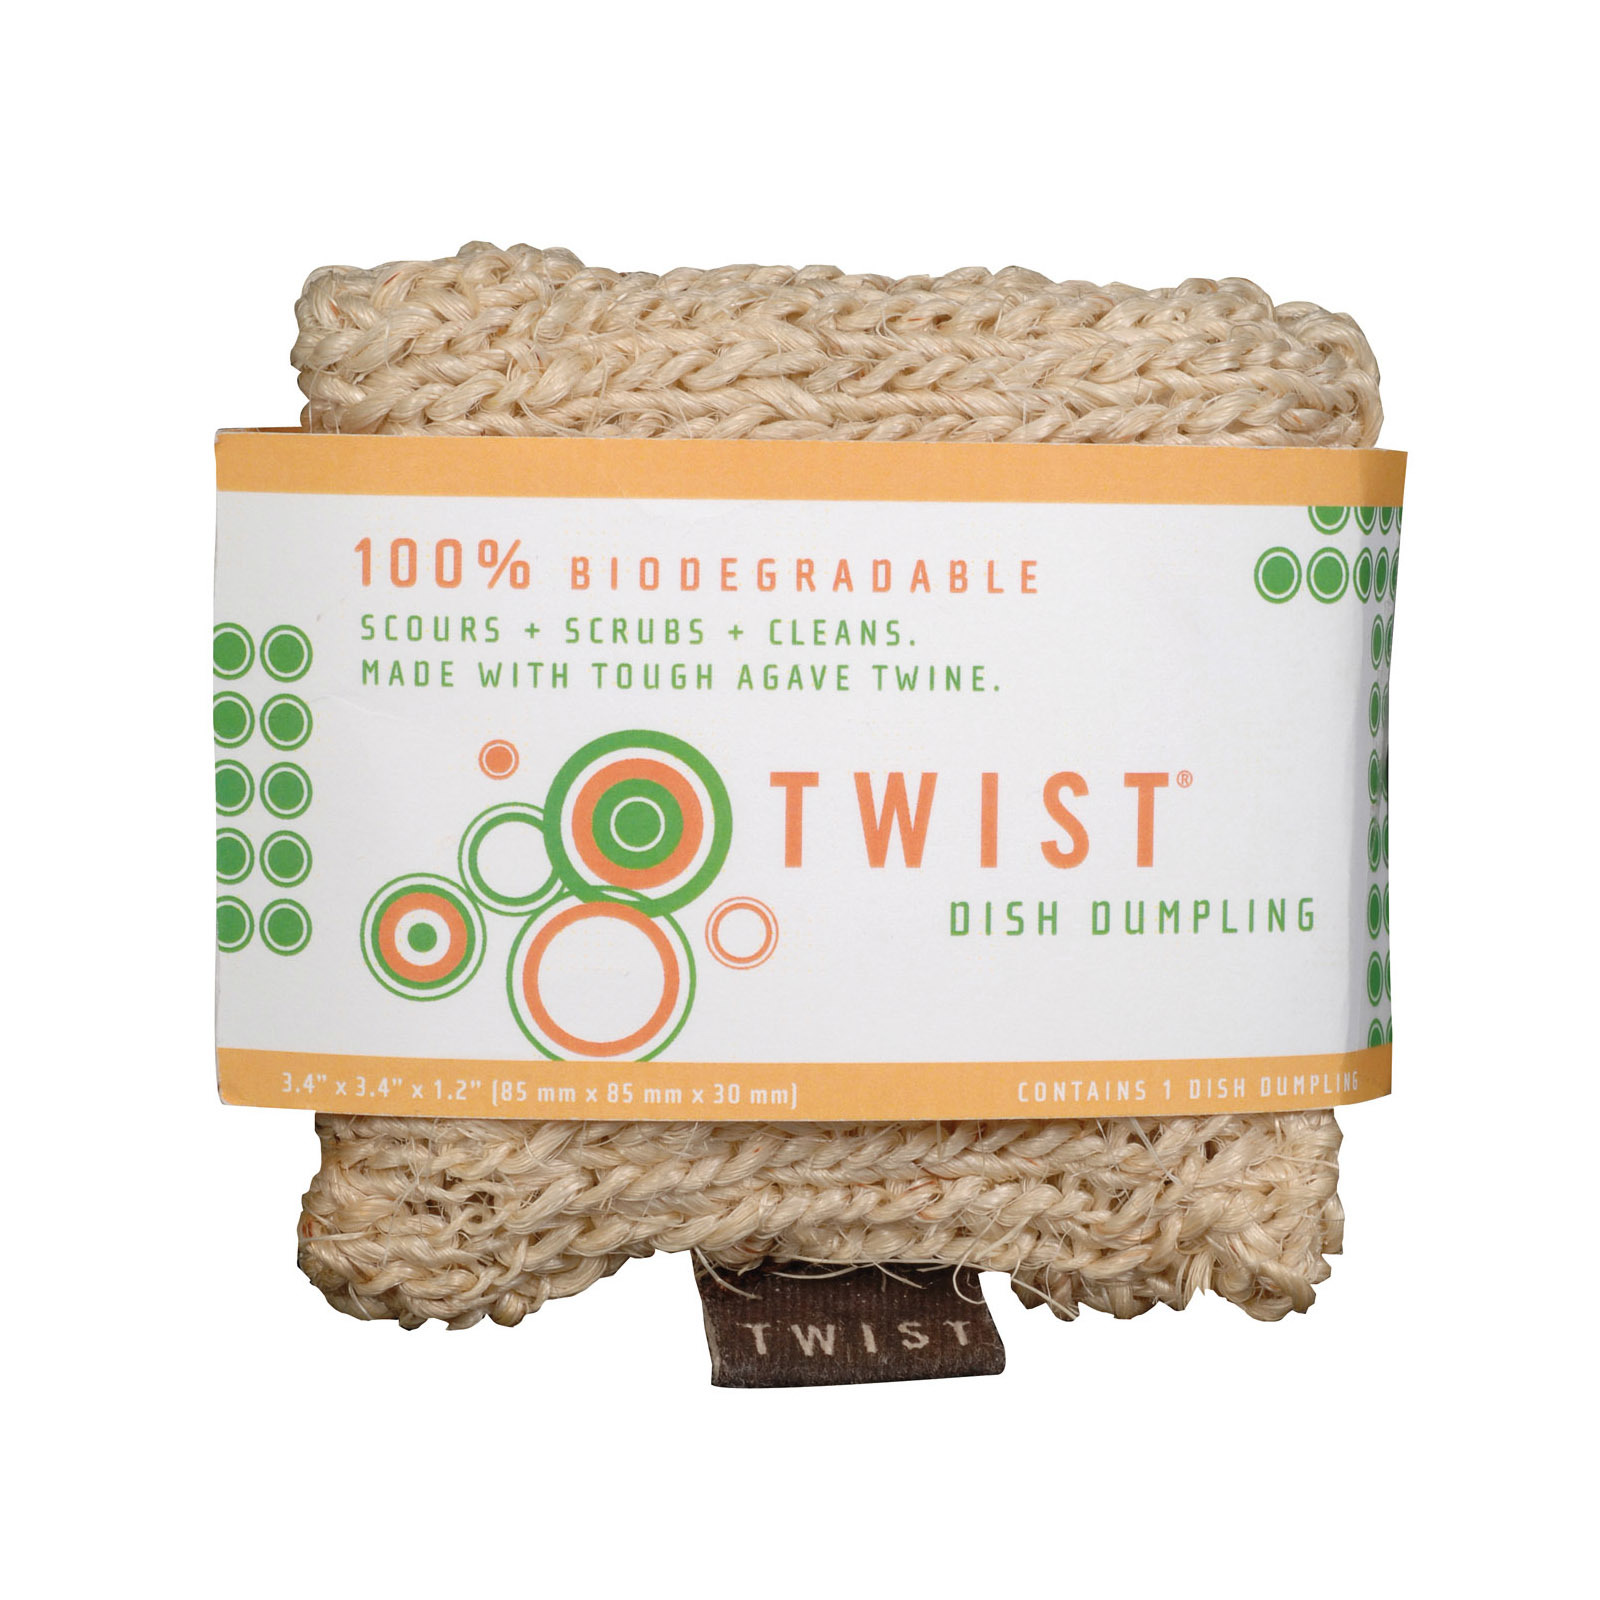 Twist Dish Dumpling - Case of 12 - 1 Count